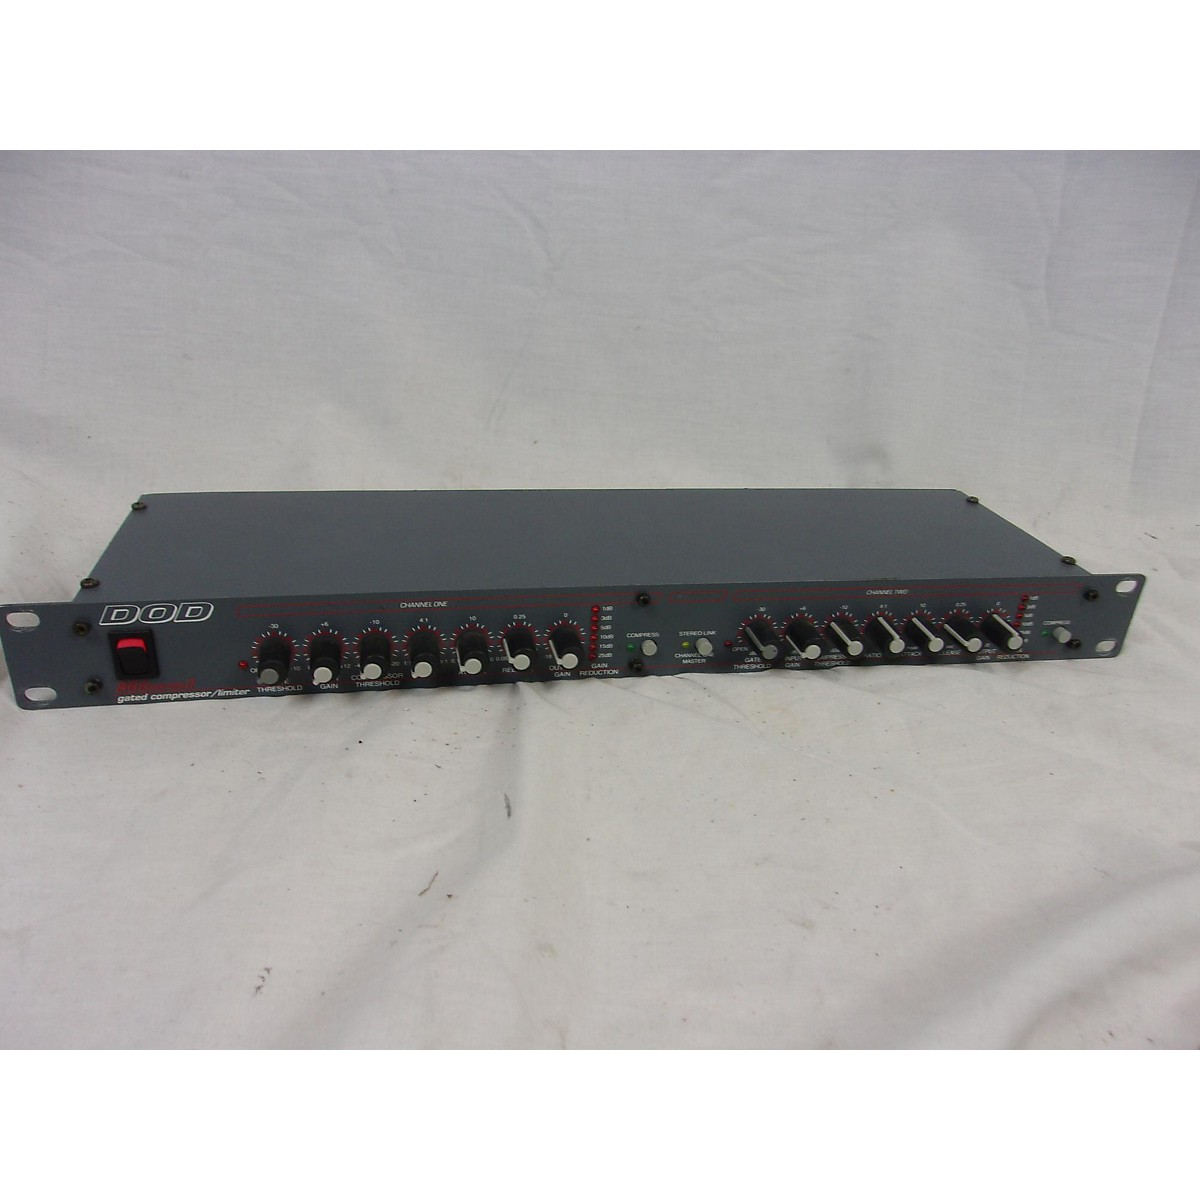 DOD 866 Series II Compressor